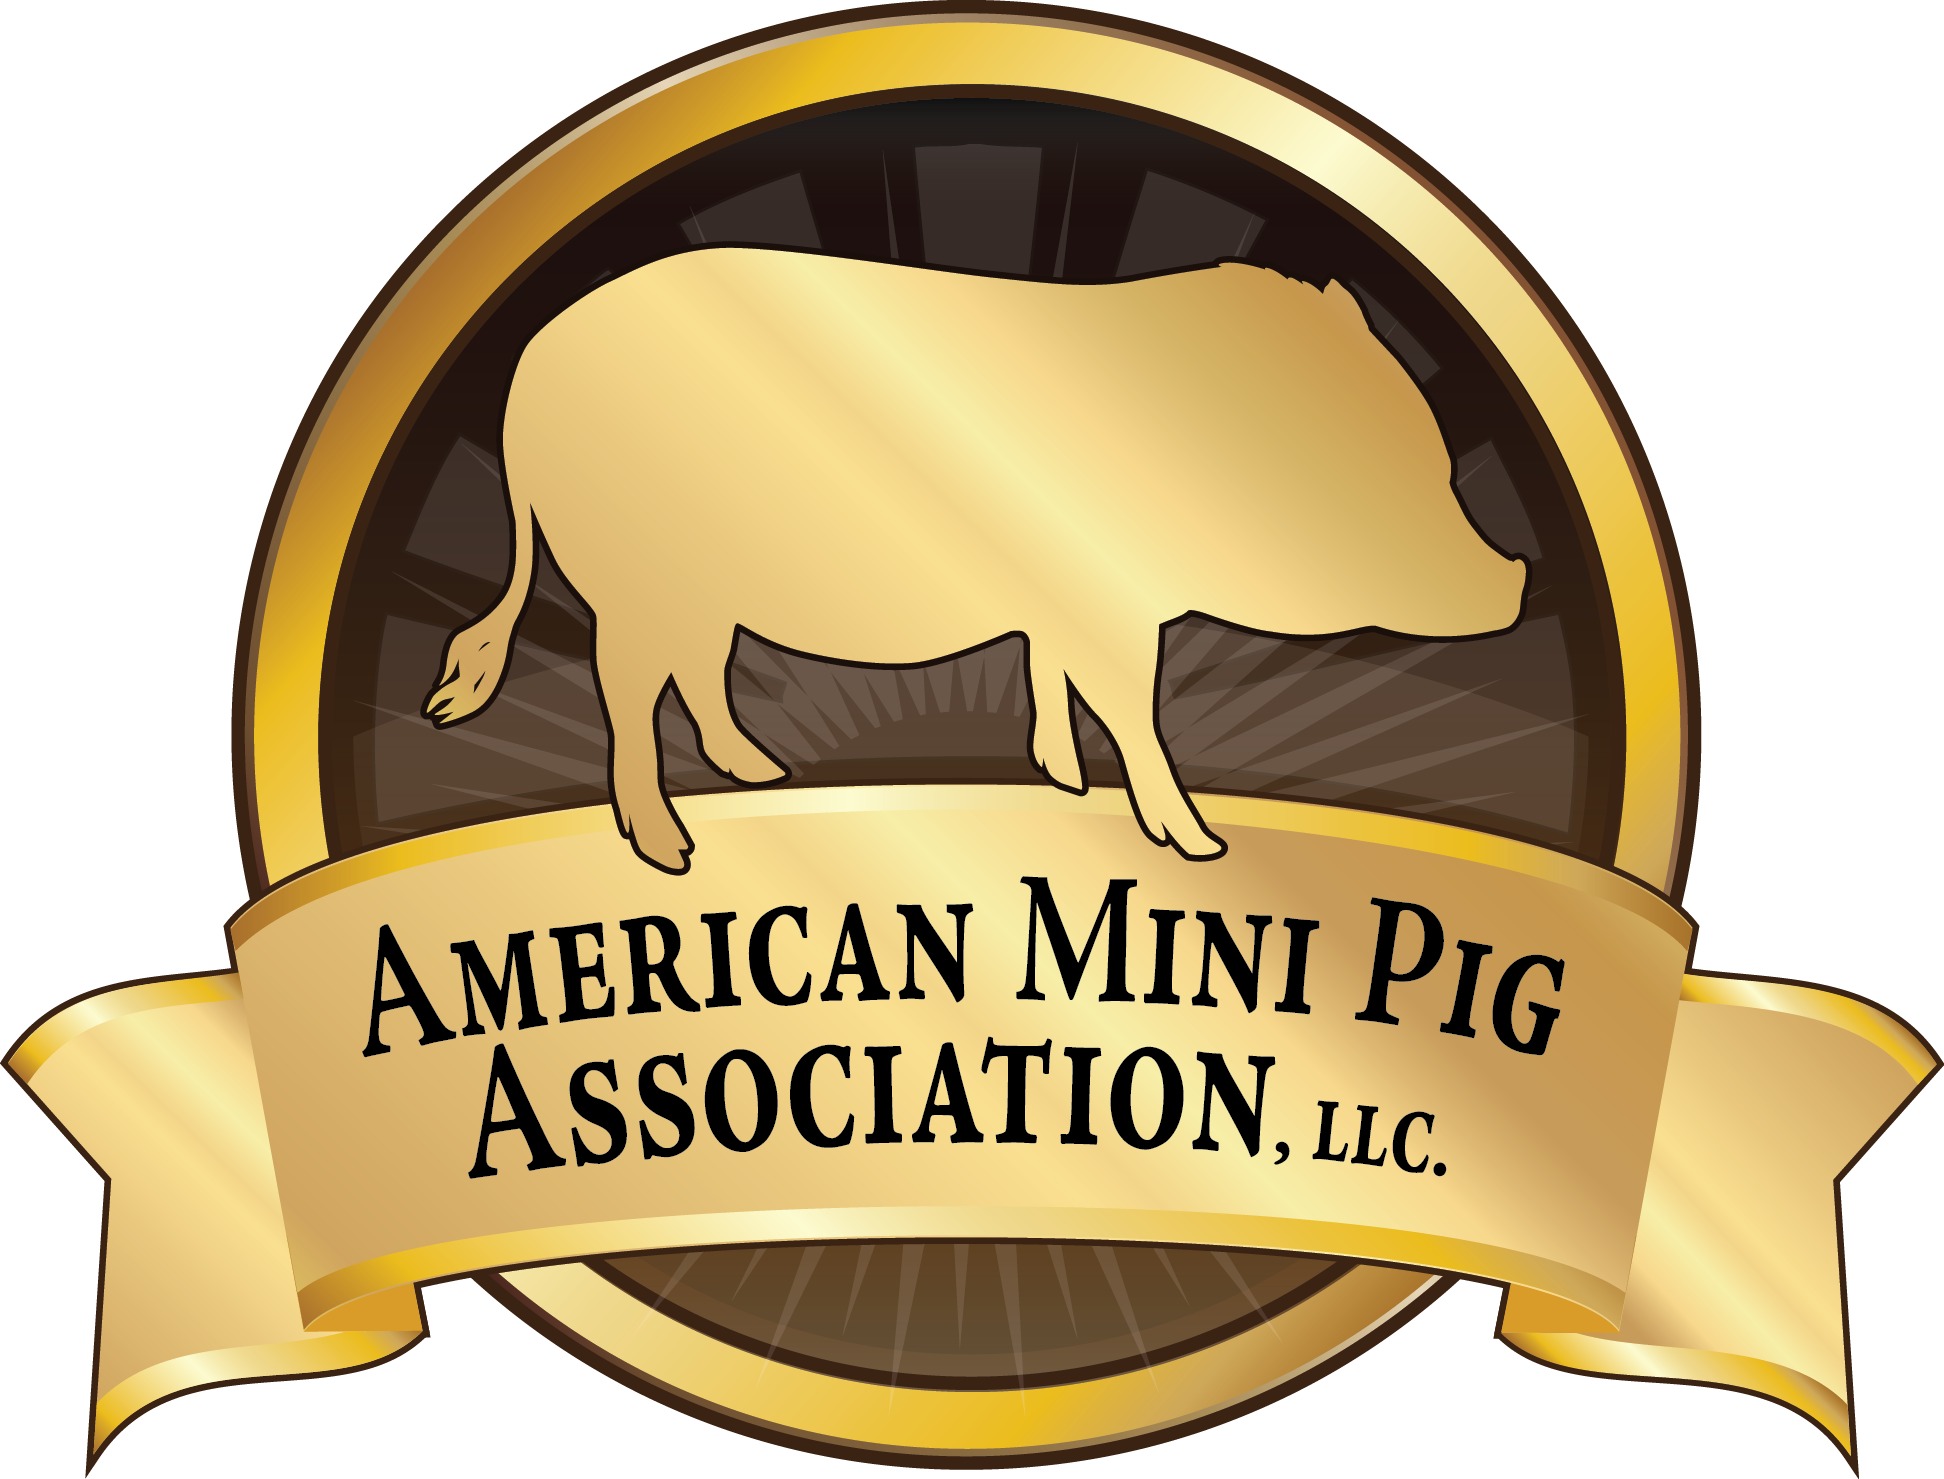 Clipart pig mini pig. American association st year